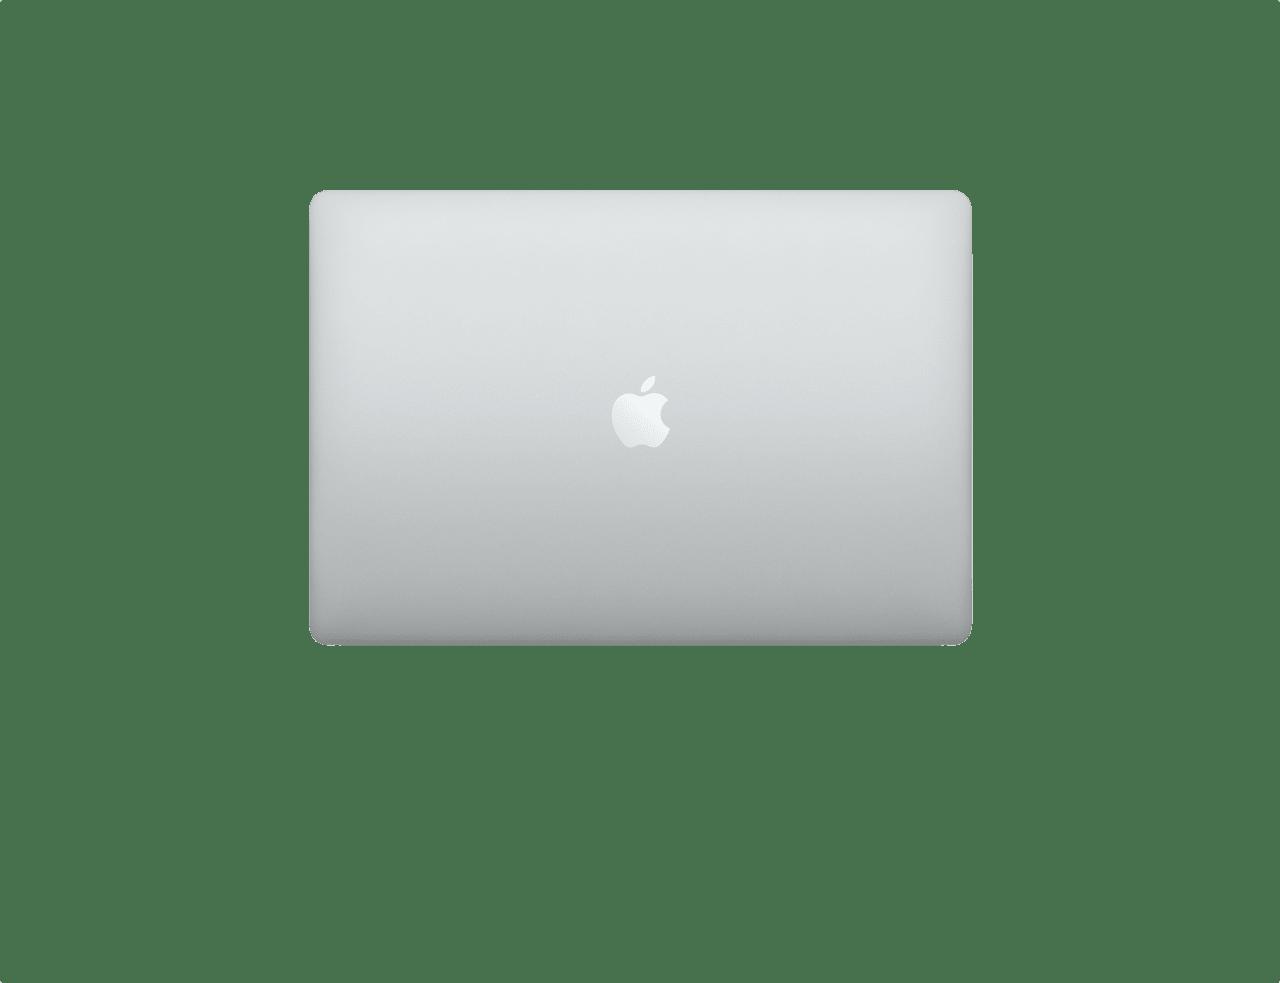 "Silber Apple 16"" MacBook Pro (Late 2019) Notebook - Intel® Core™ i9-9880H - 32GB - 1TB SSD - AMD Radeon Pro 5500M (4GB).3"